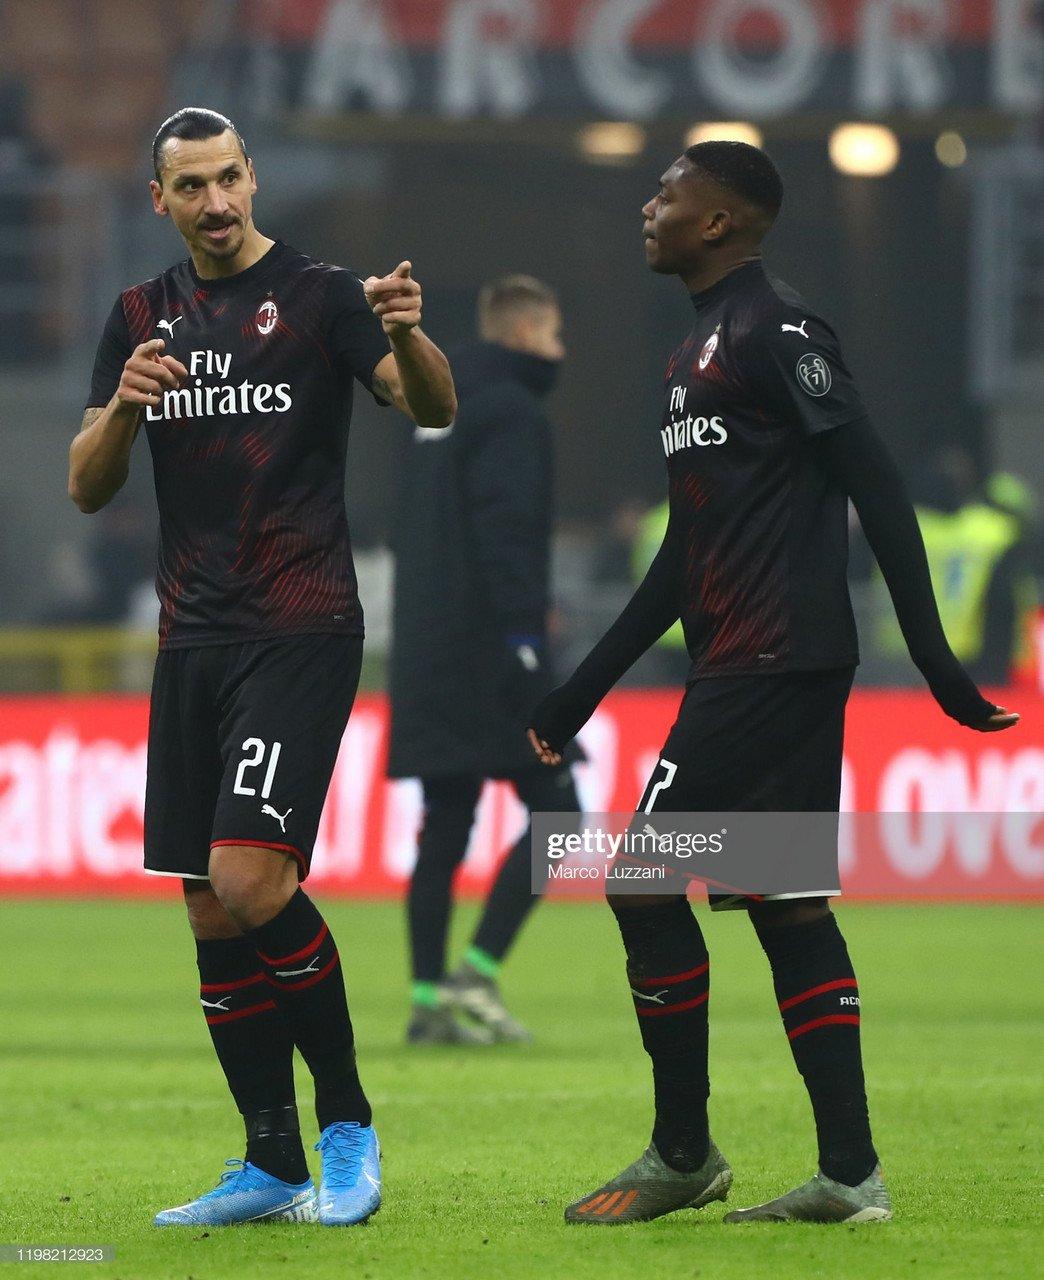 Cagliari vs AC Milan: Can the Rossoneri finally secure a victory?